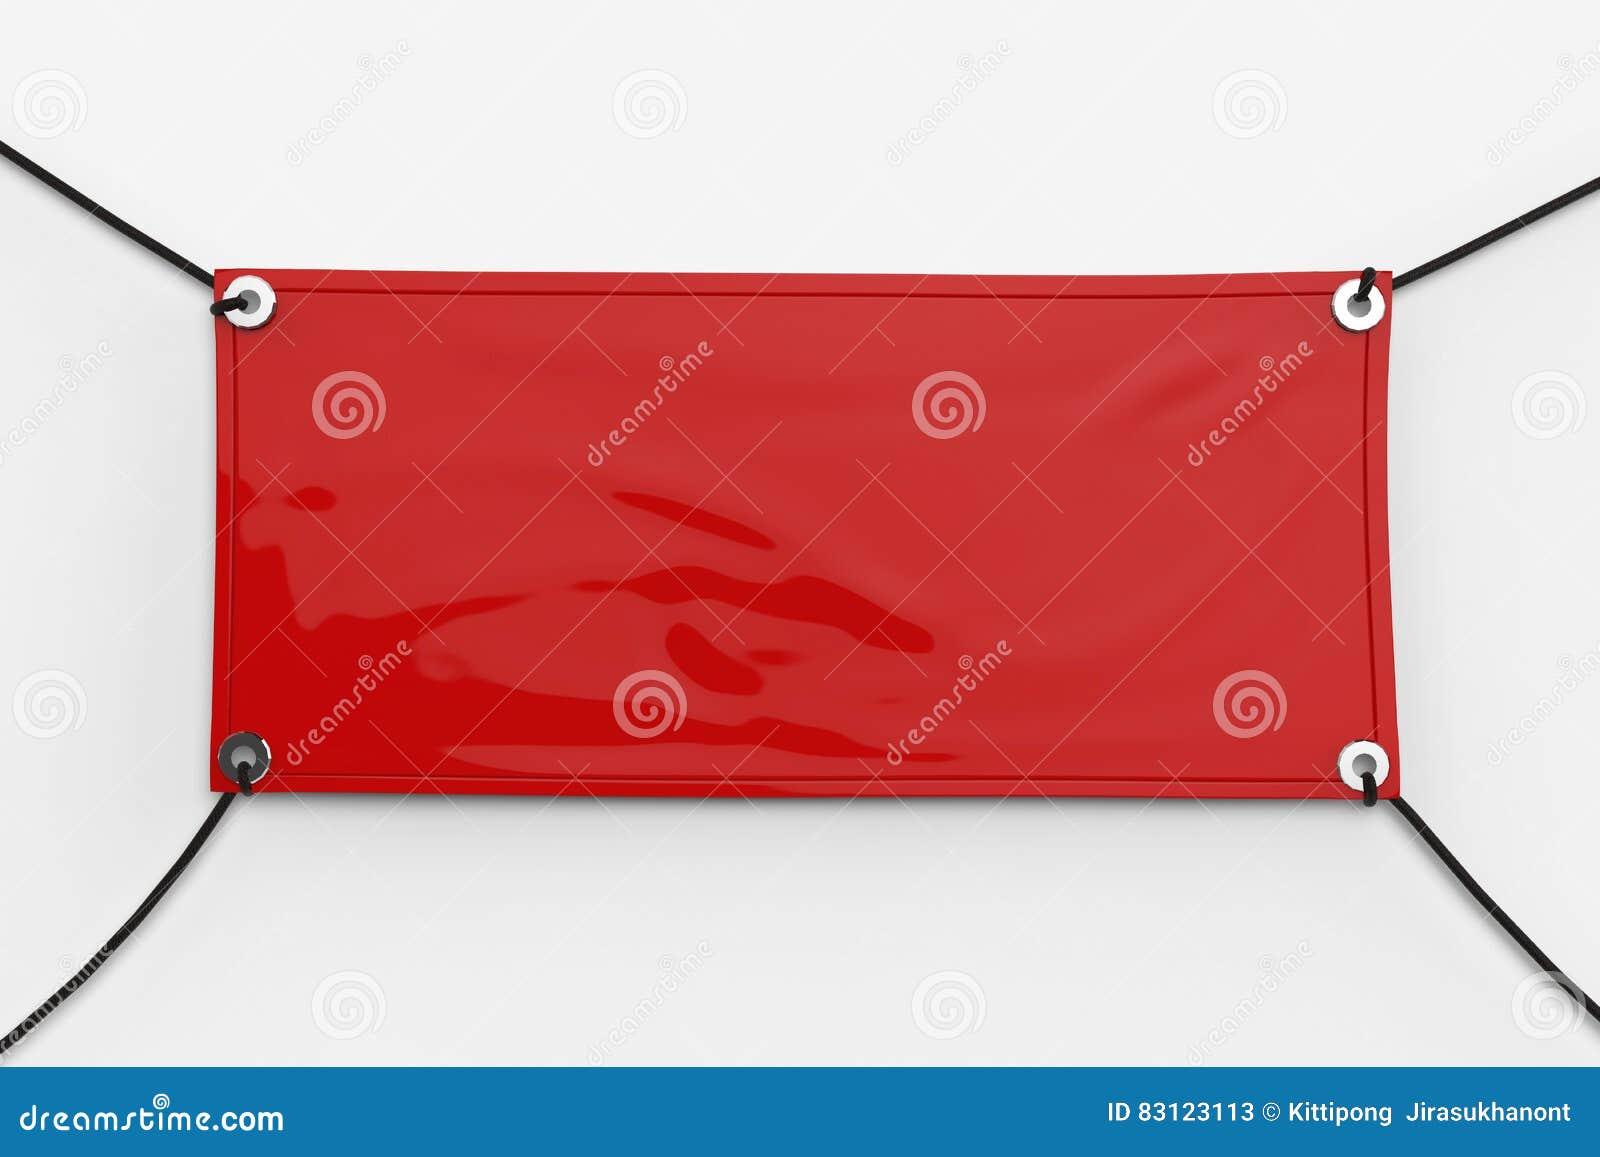 Red vinyl banner